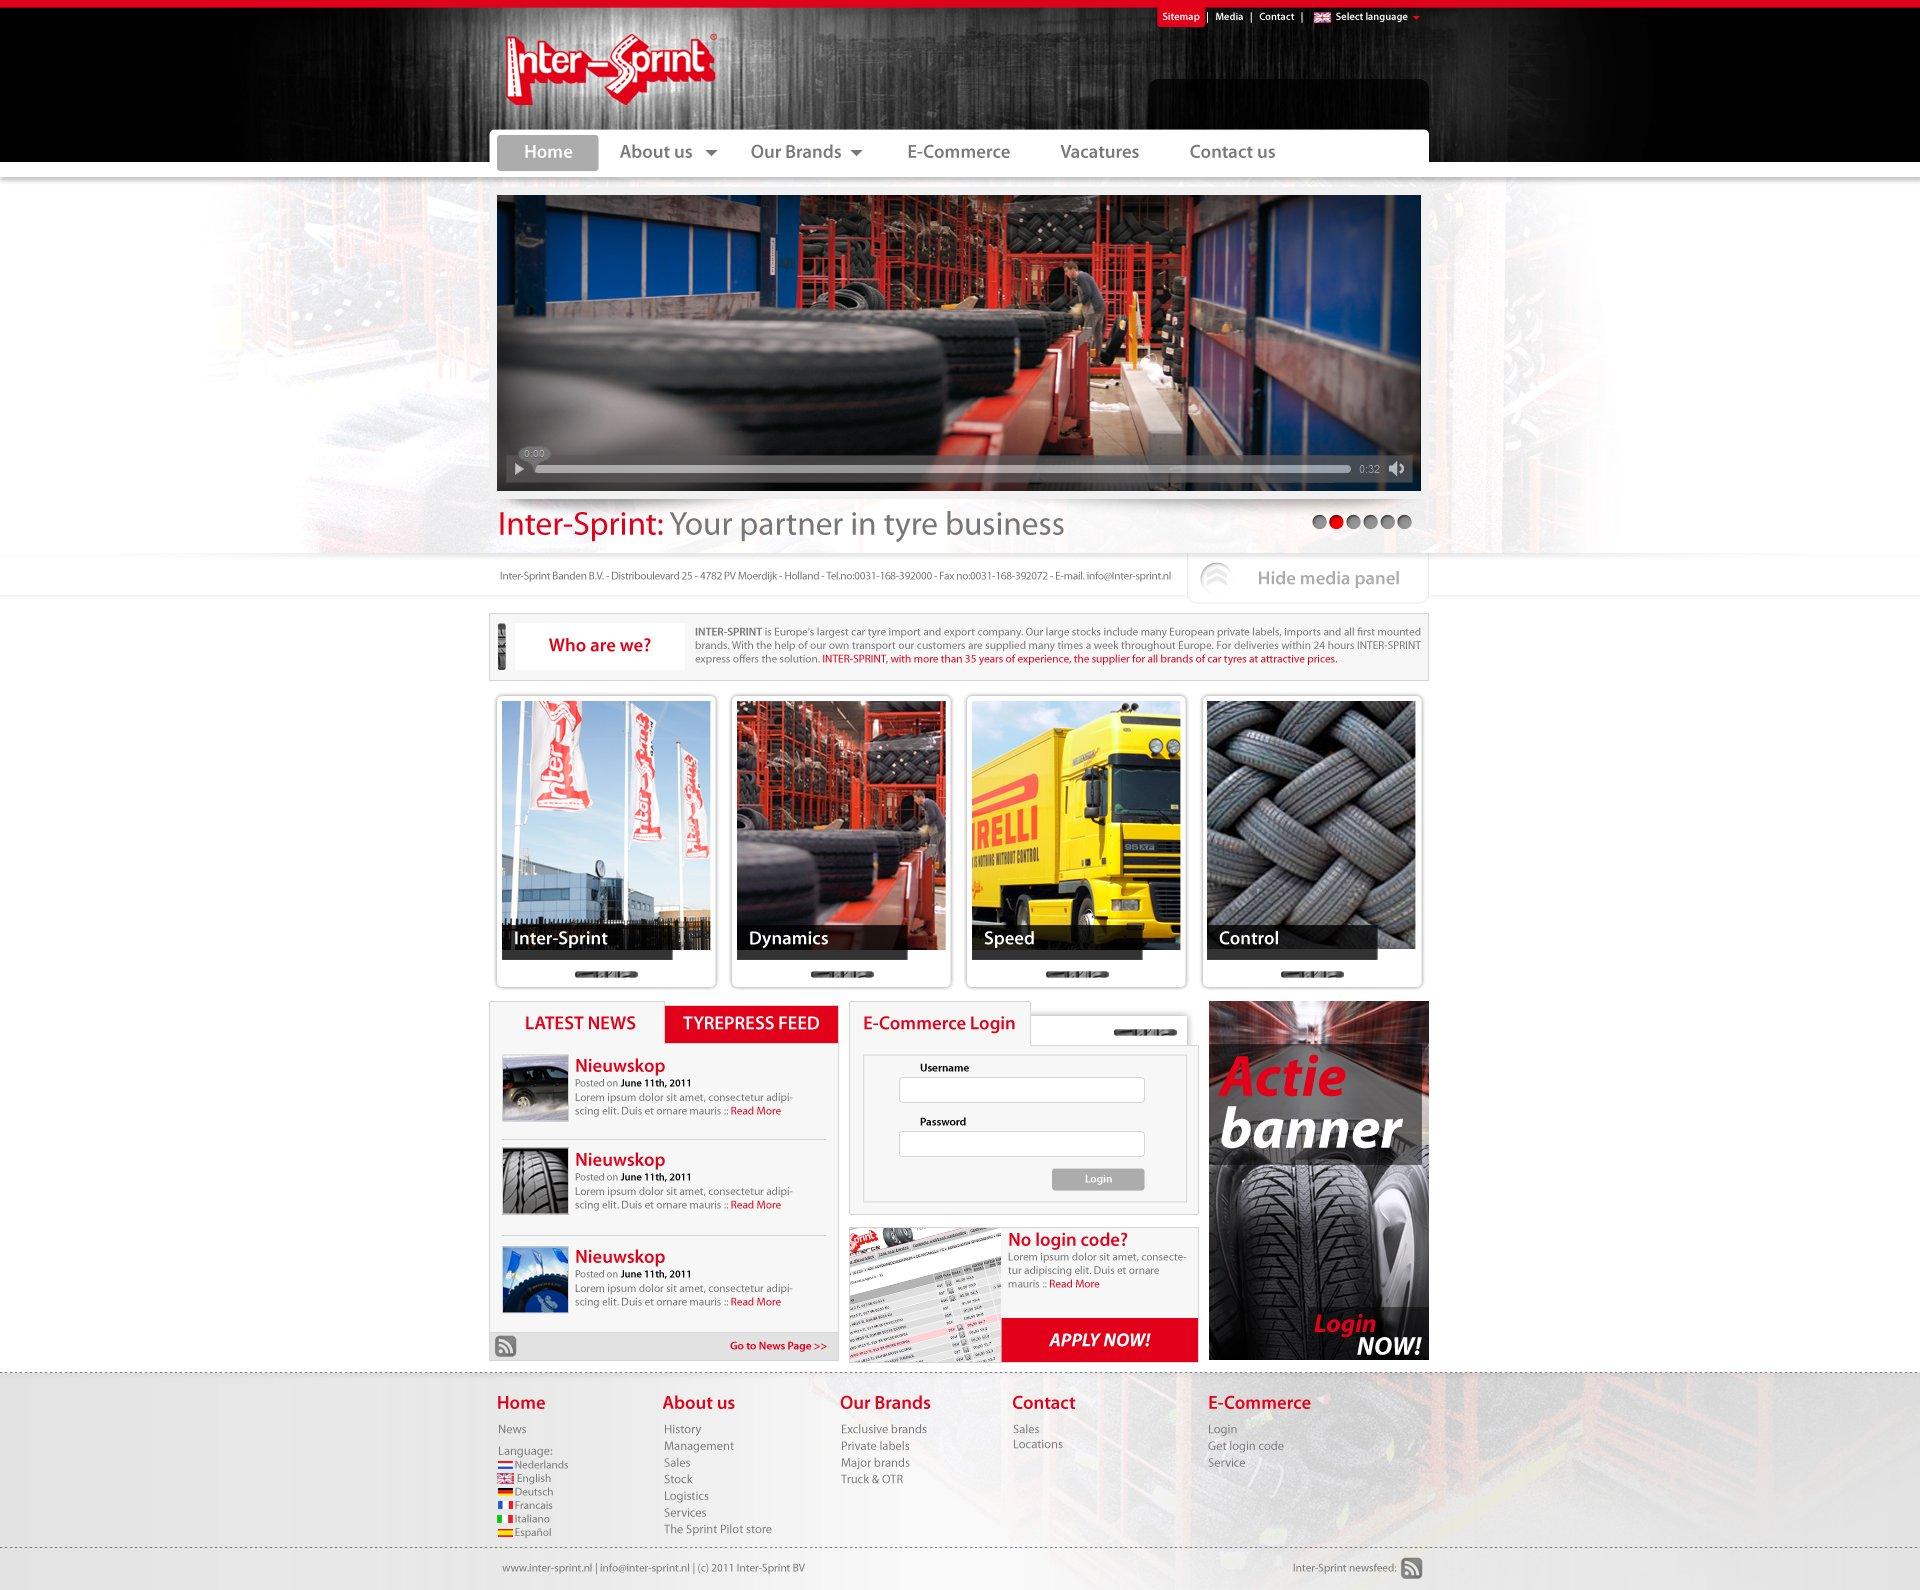 Inter-Sprint website Design